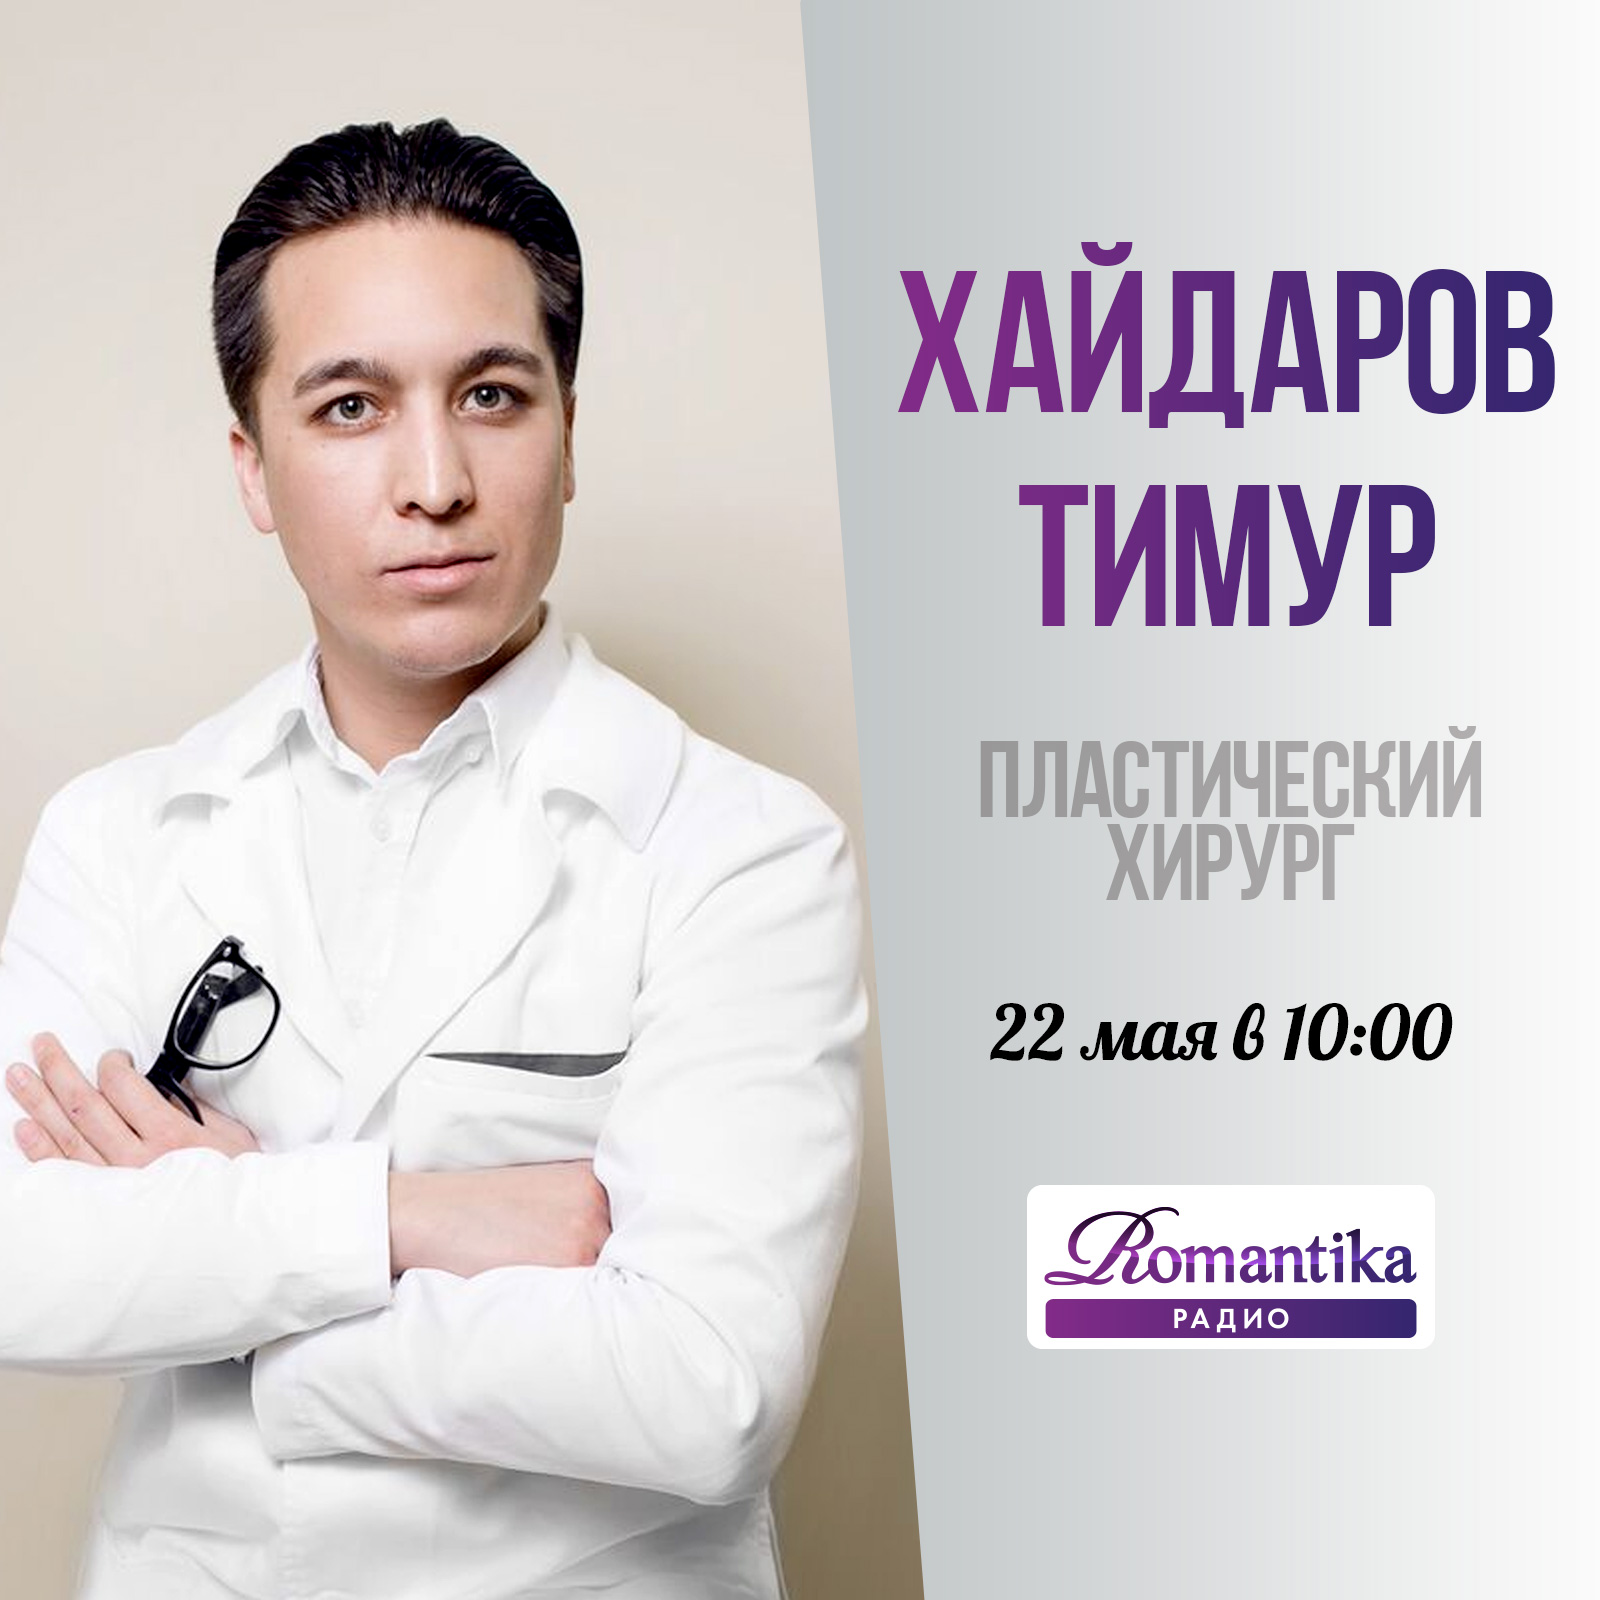 Утро на радио Romantika: 22 мая – в гостях пластический хирург Хайдаров Тимур - Радио Romantika